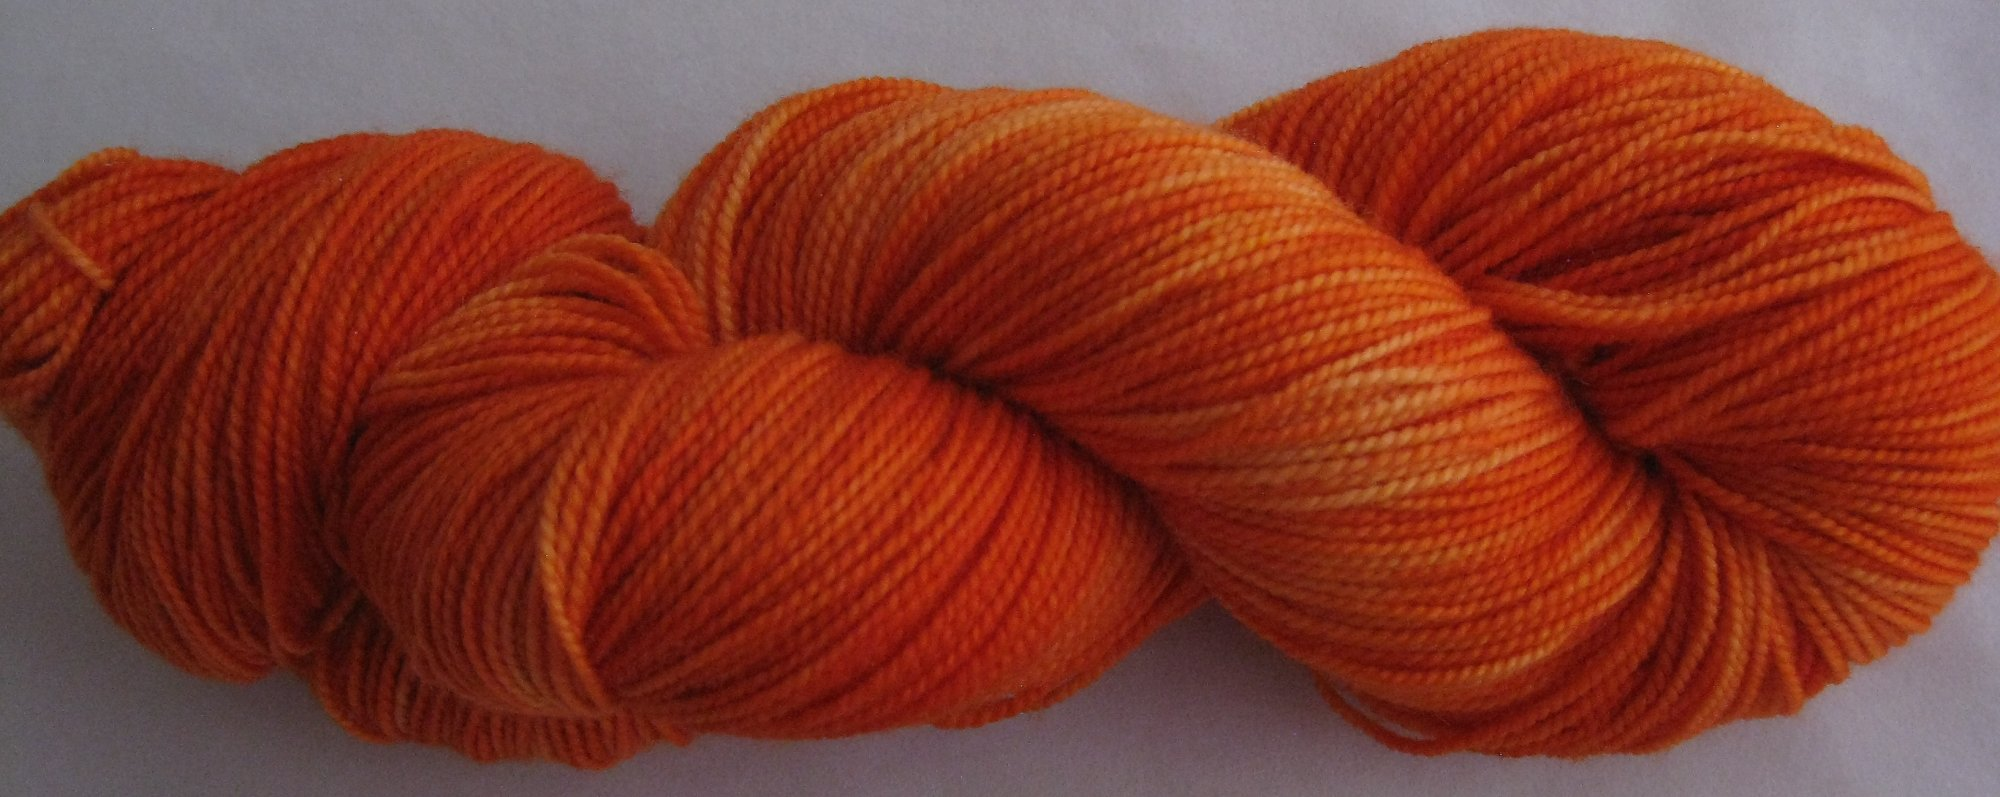 Shockwork Orange - Galaxy